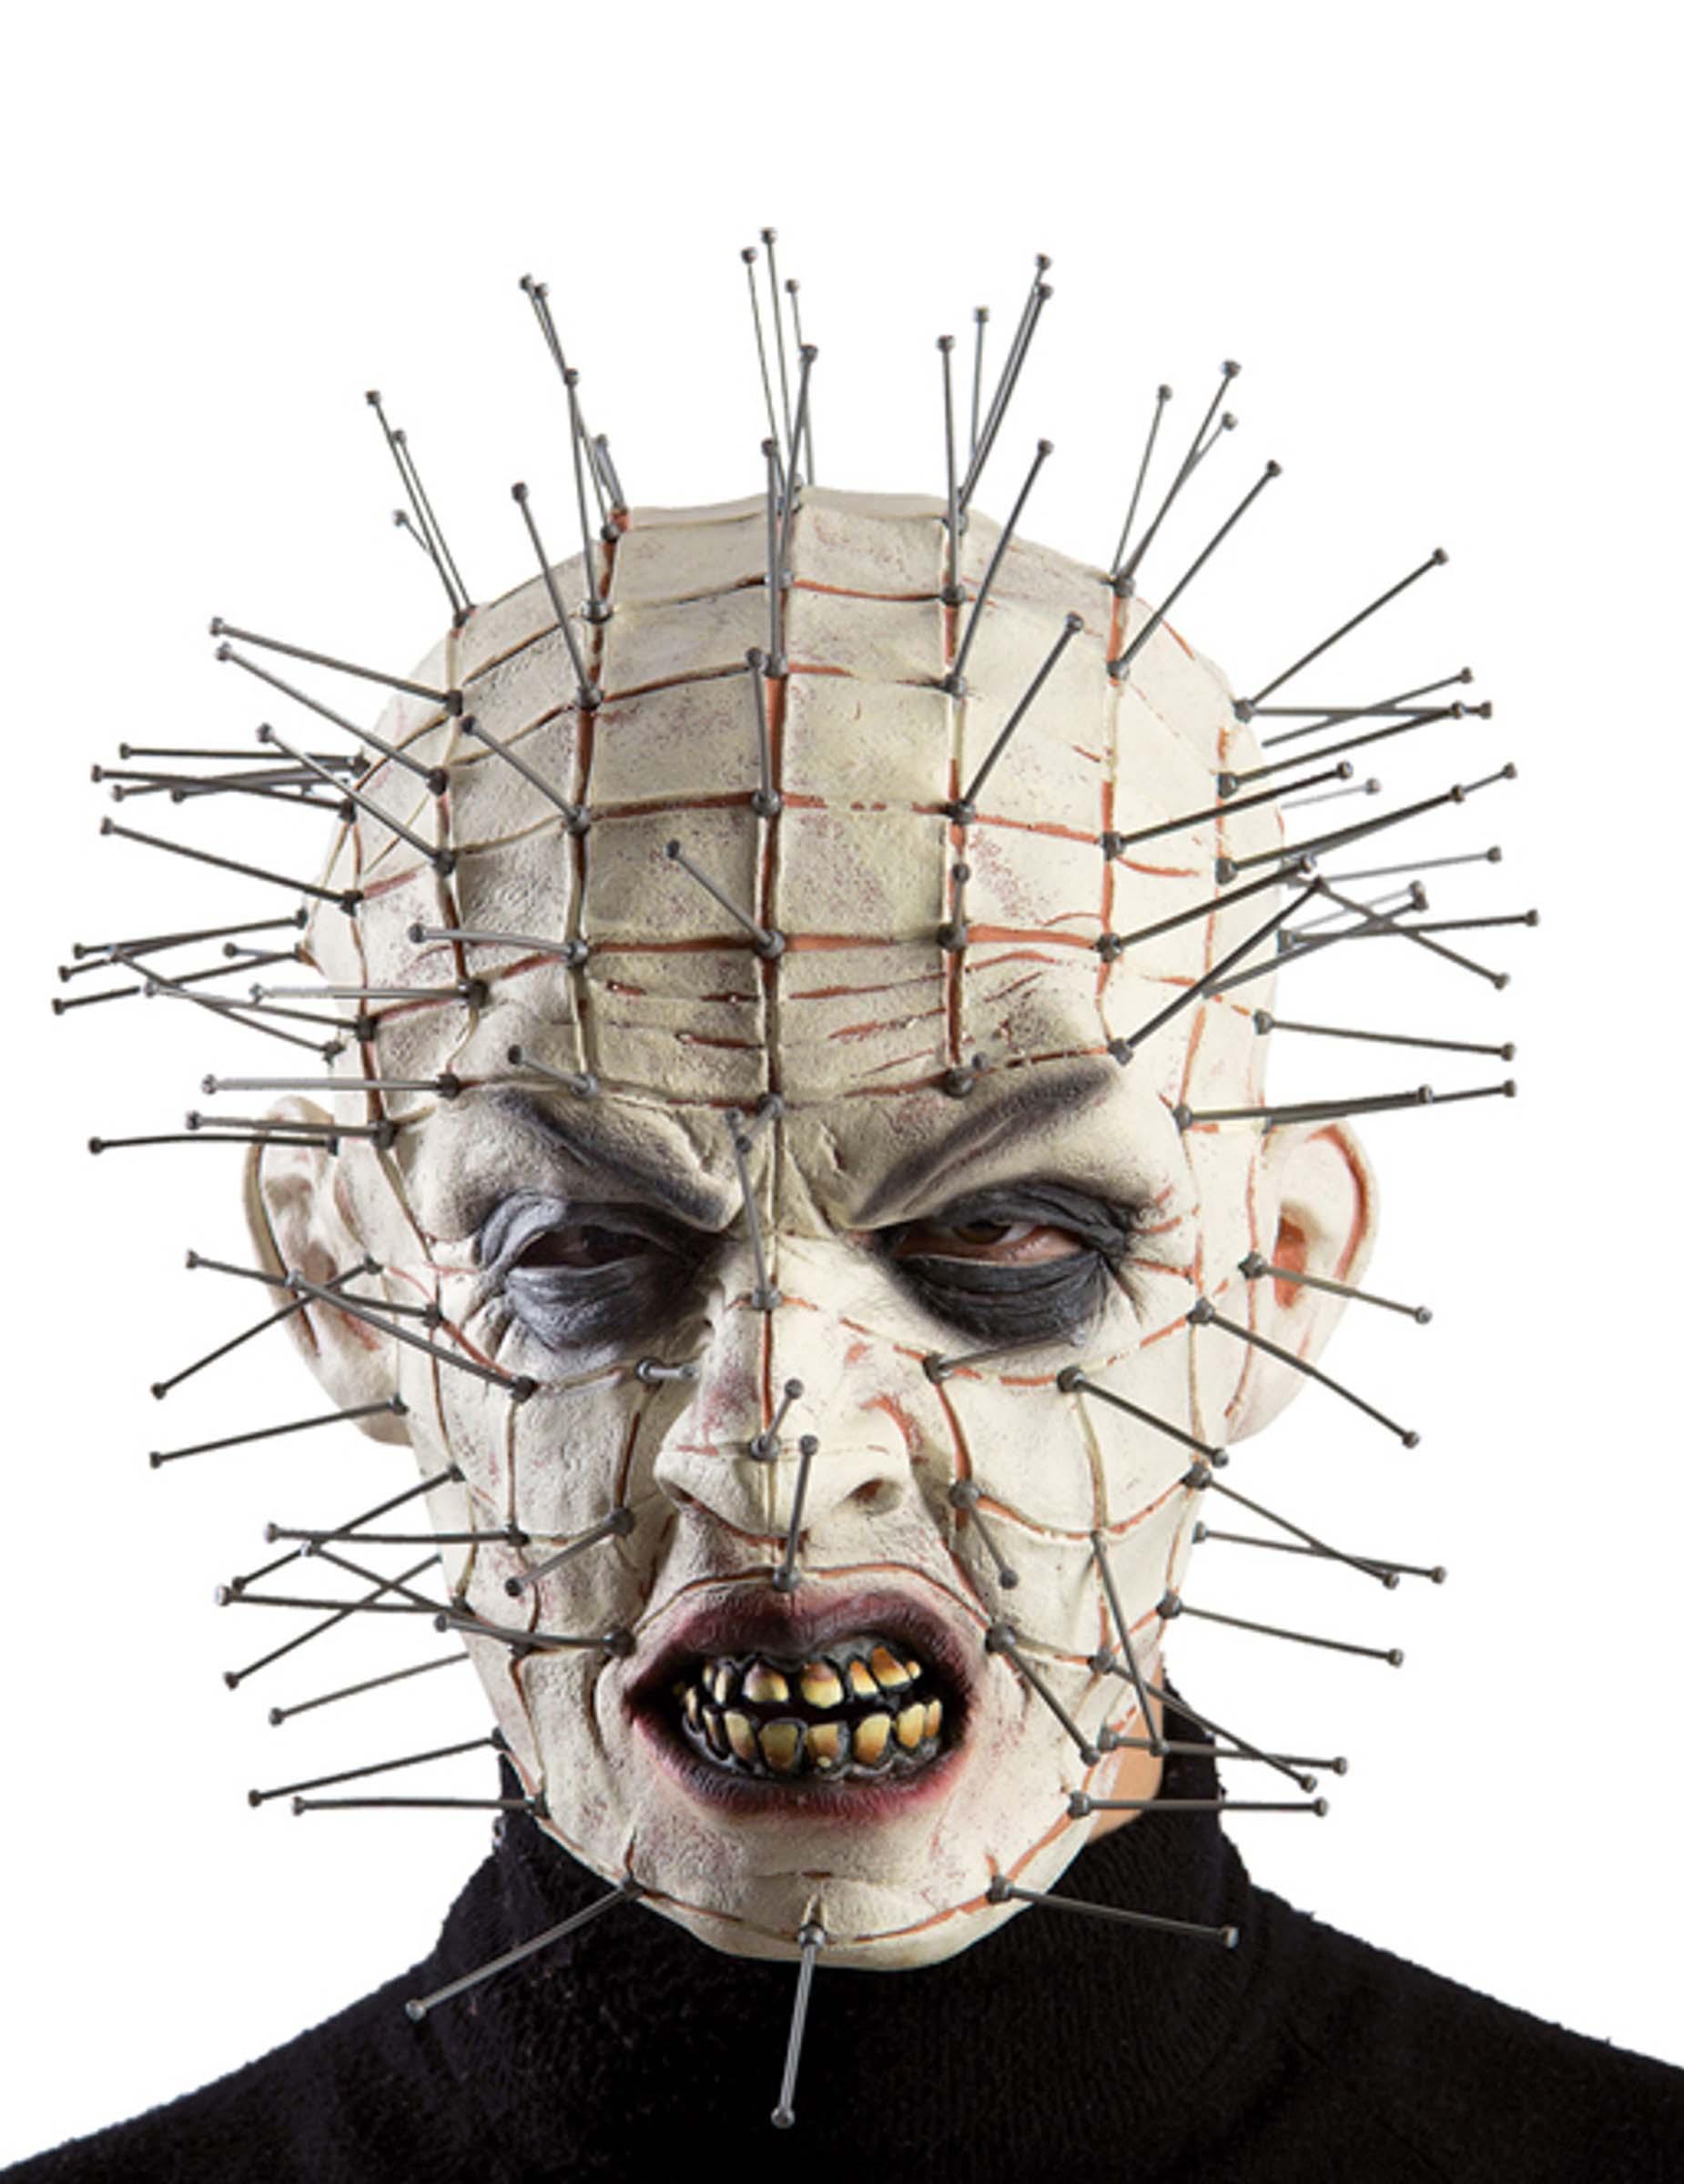 Masque monstre avec aiguilles adulte halloween deguise toi achat de masques - Masque halloween a fabriquer ...